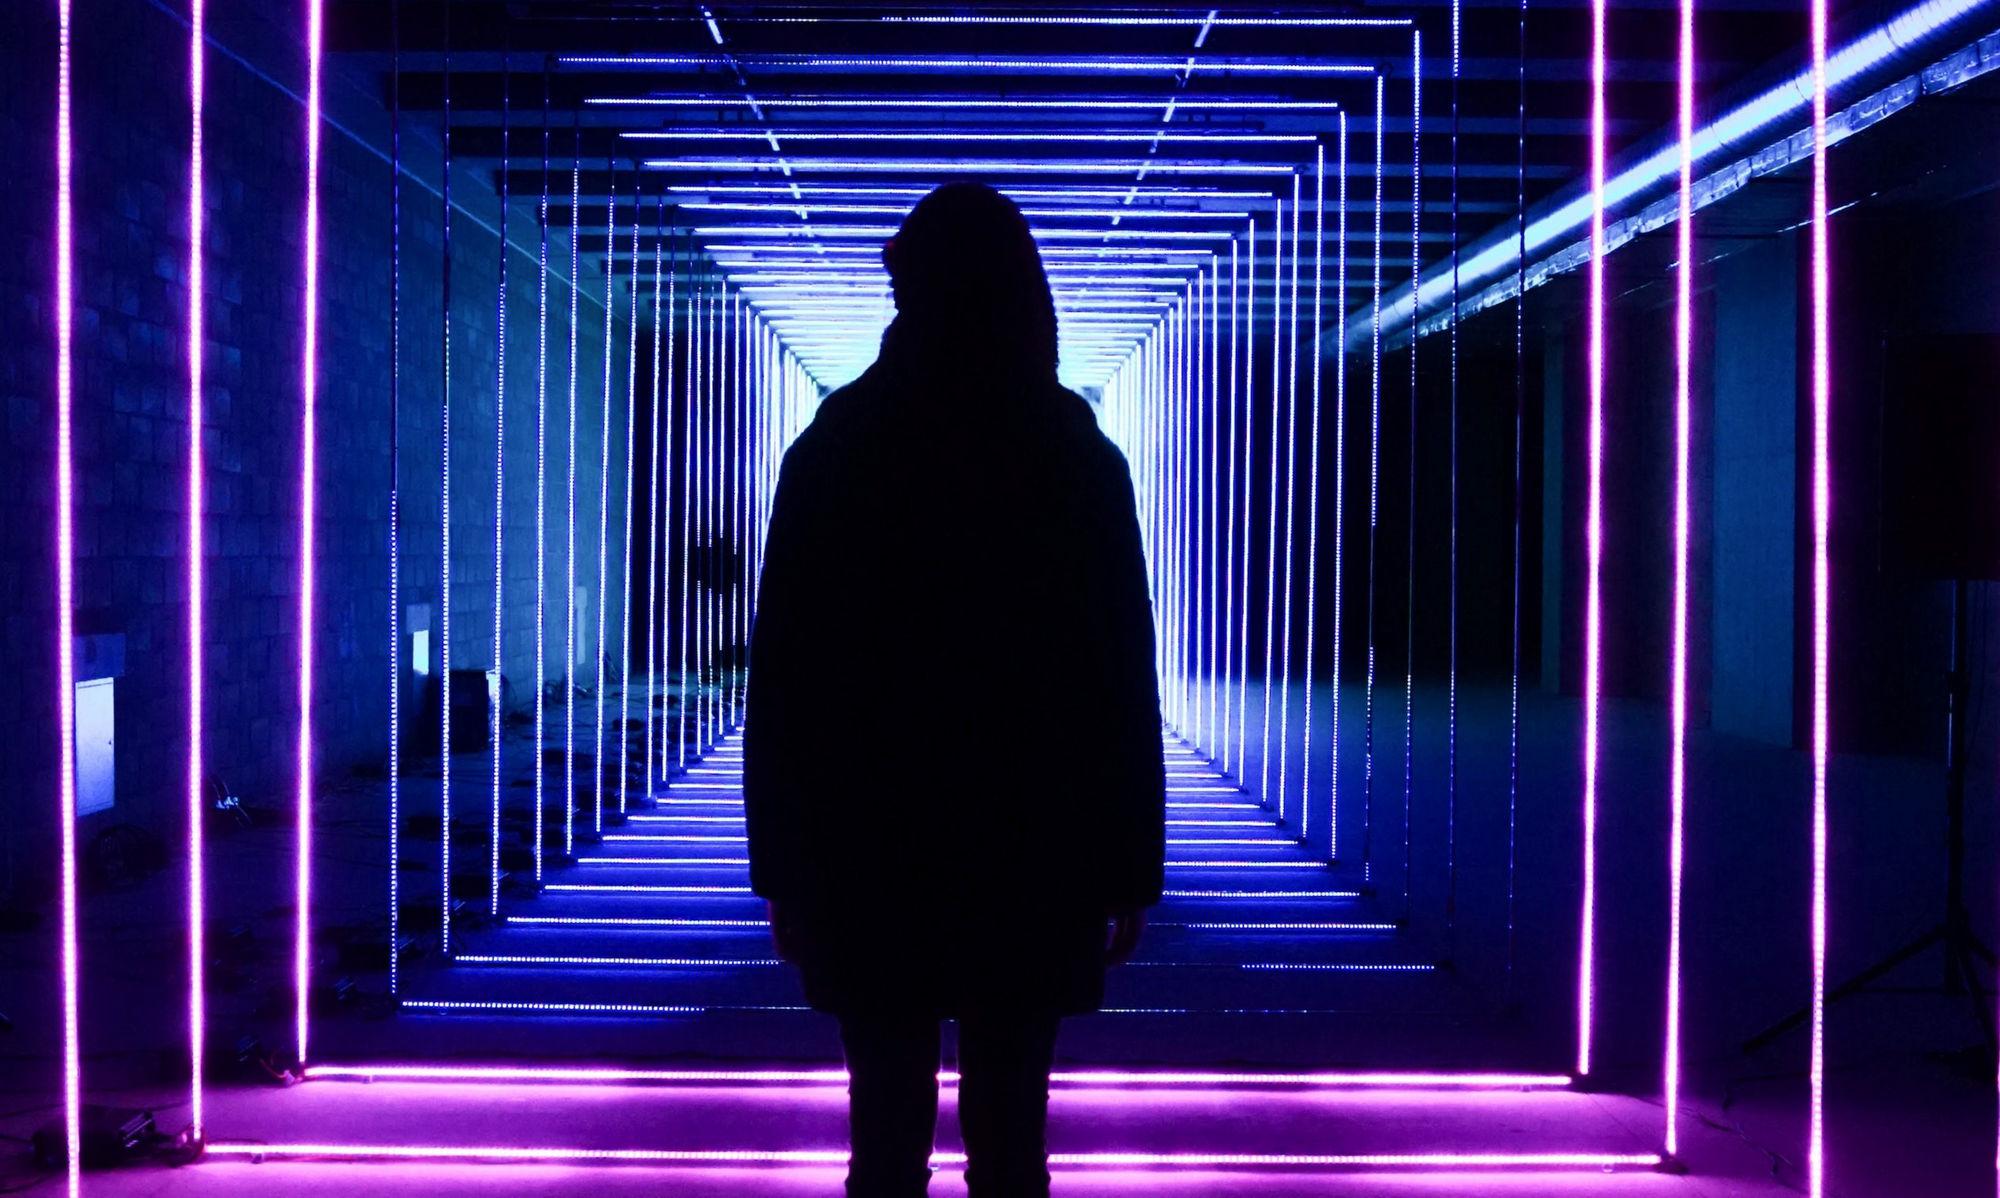 Silhouette in neon lit hallway